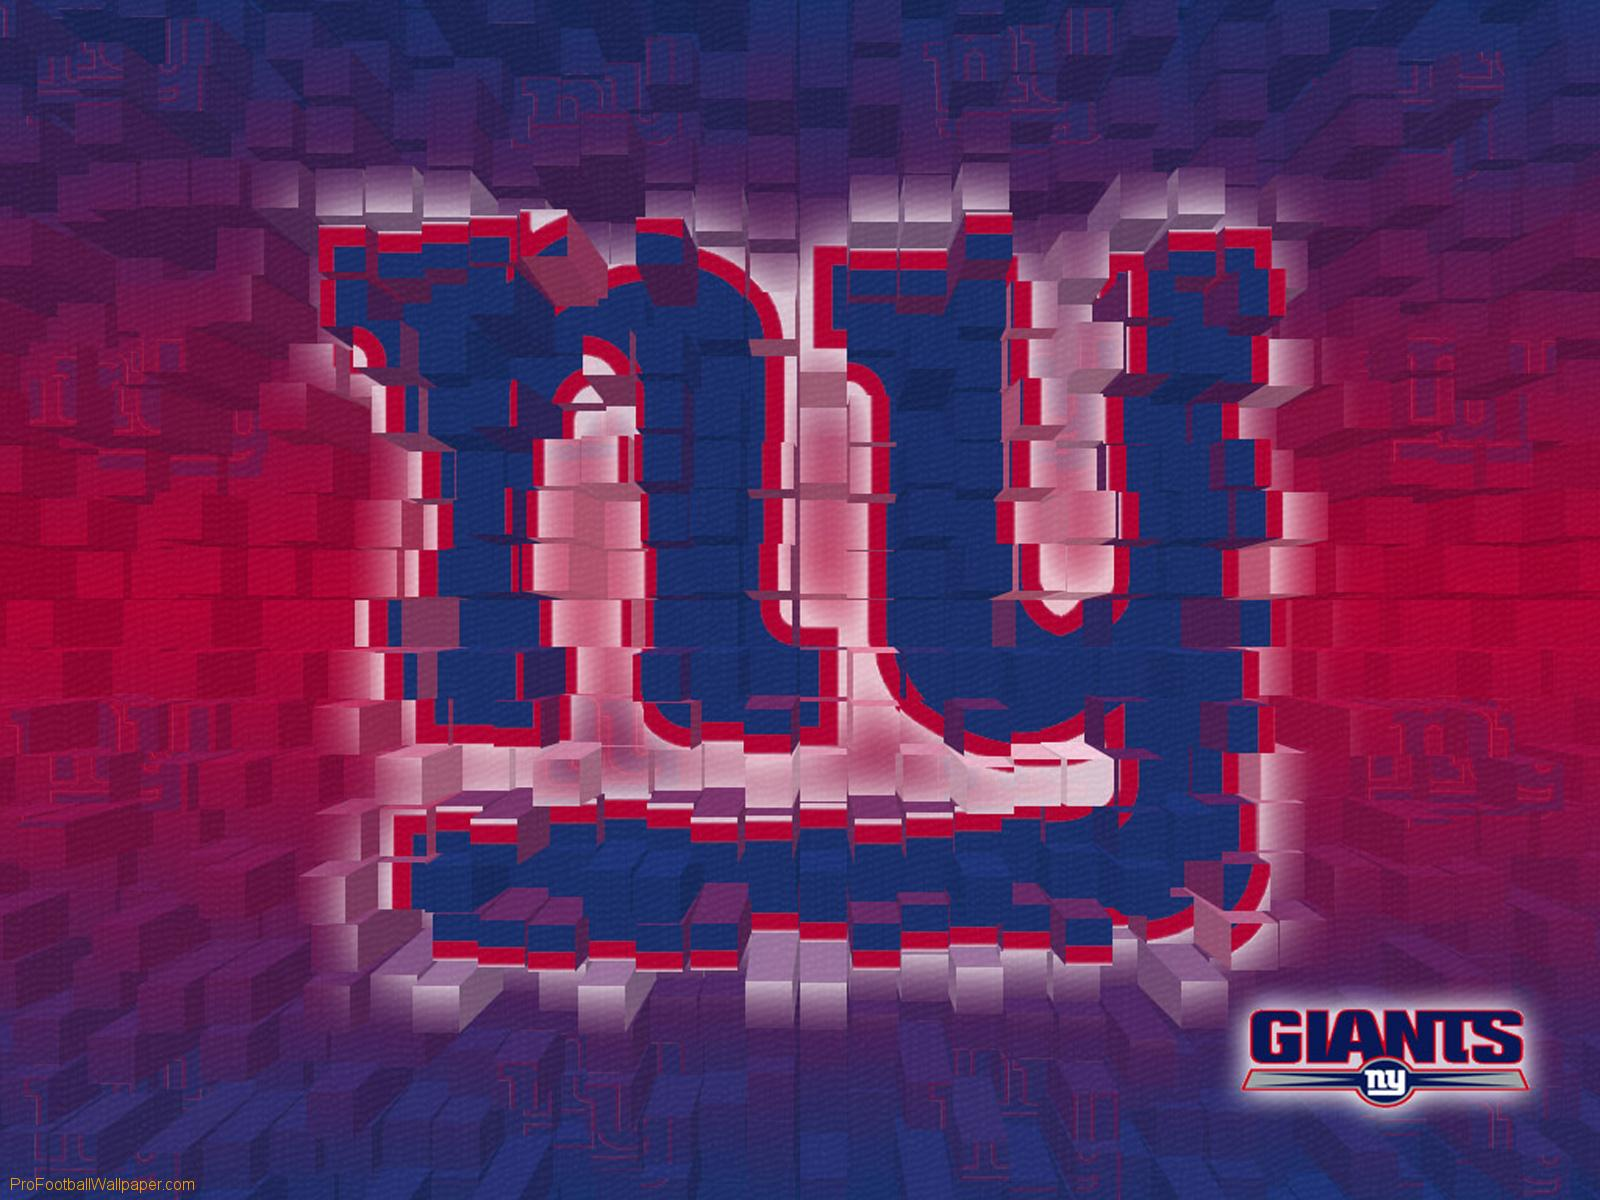 45 New York Giants 3d Wallpaper On Wallpapersafari